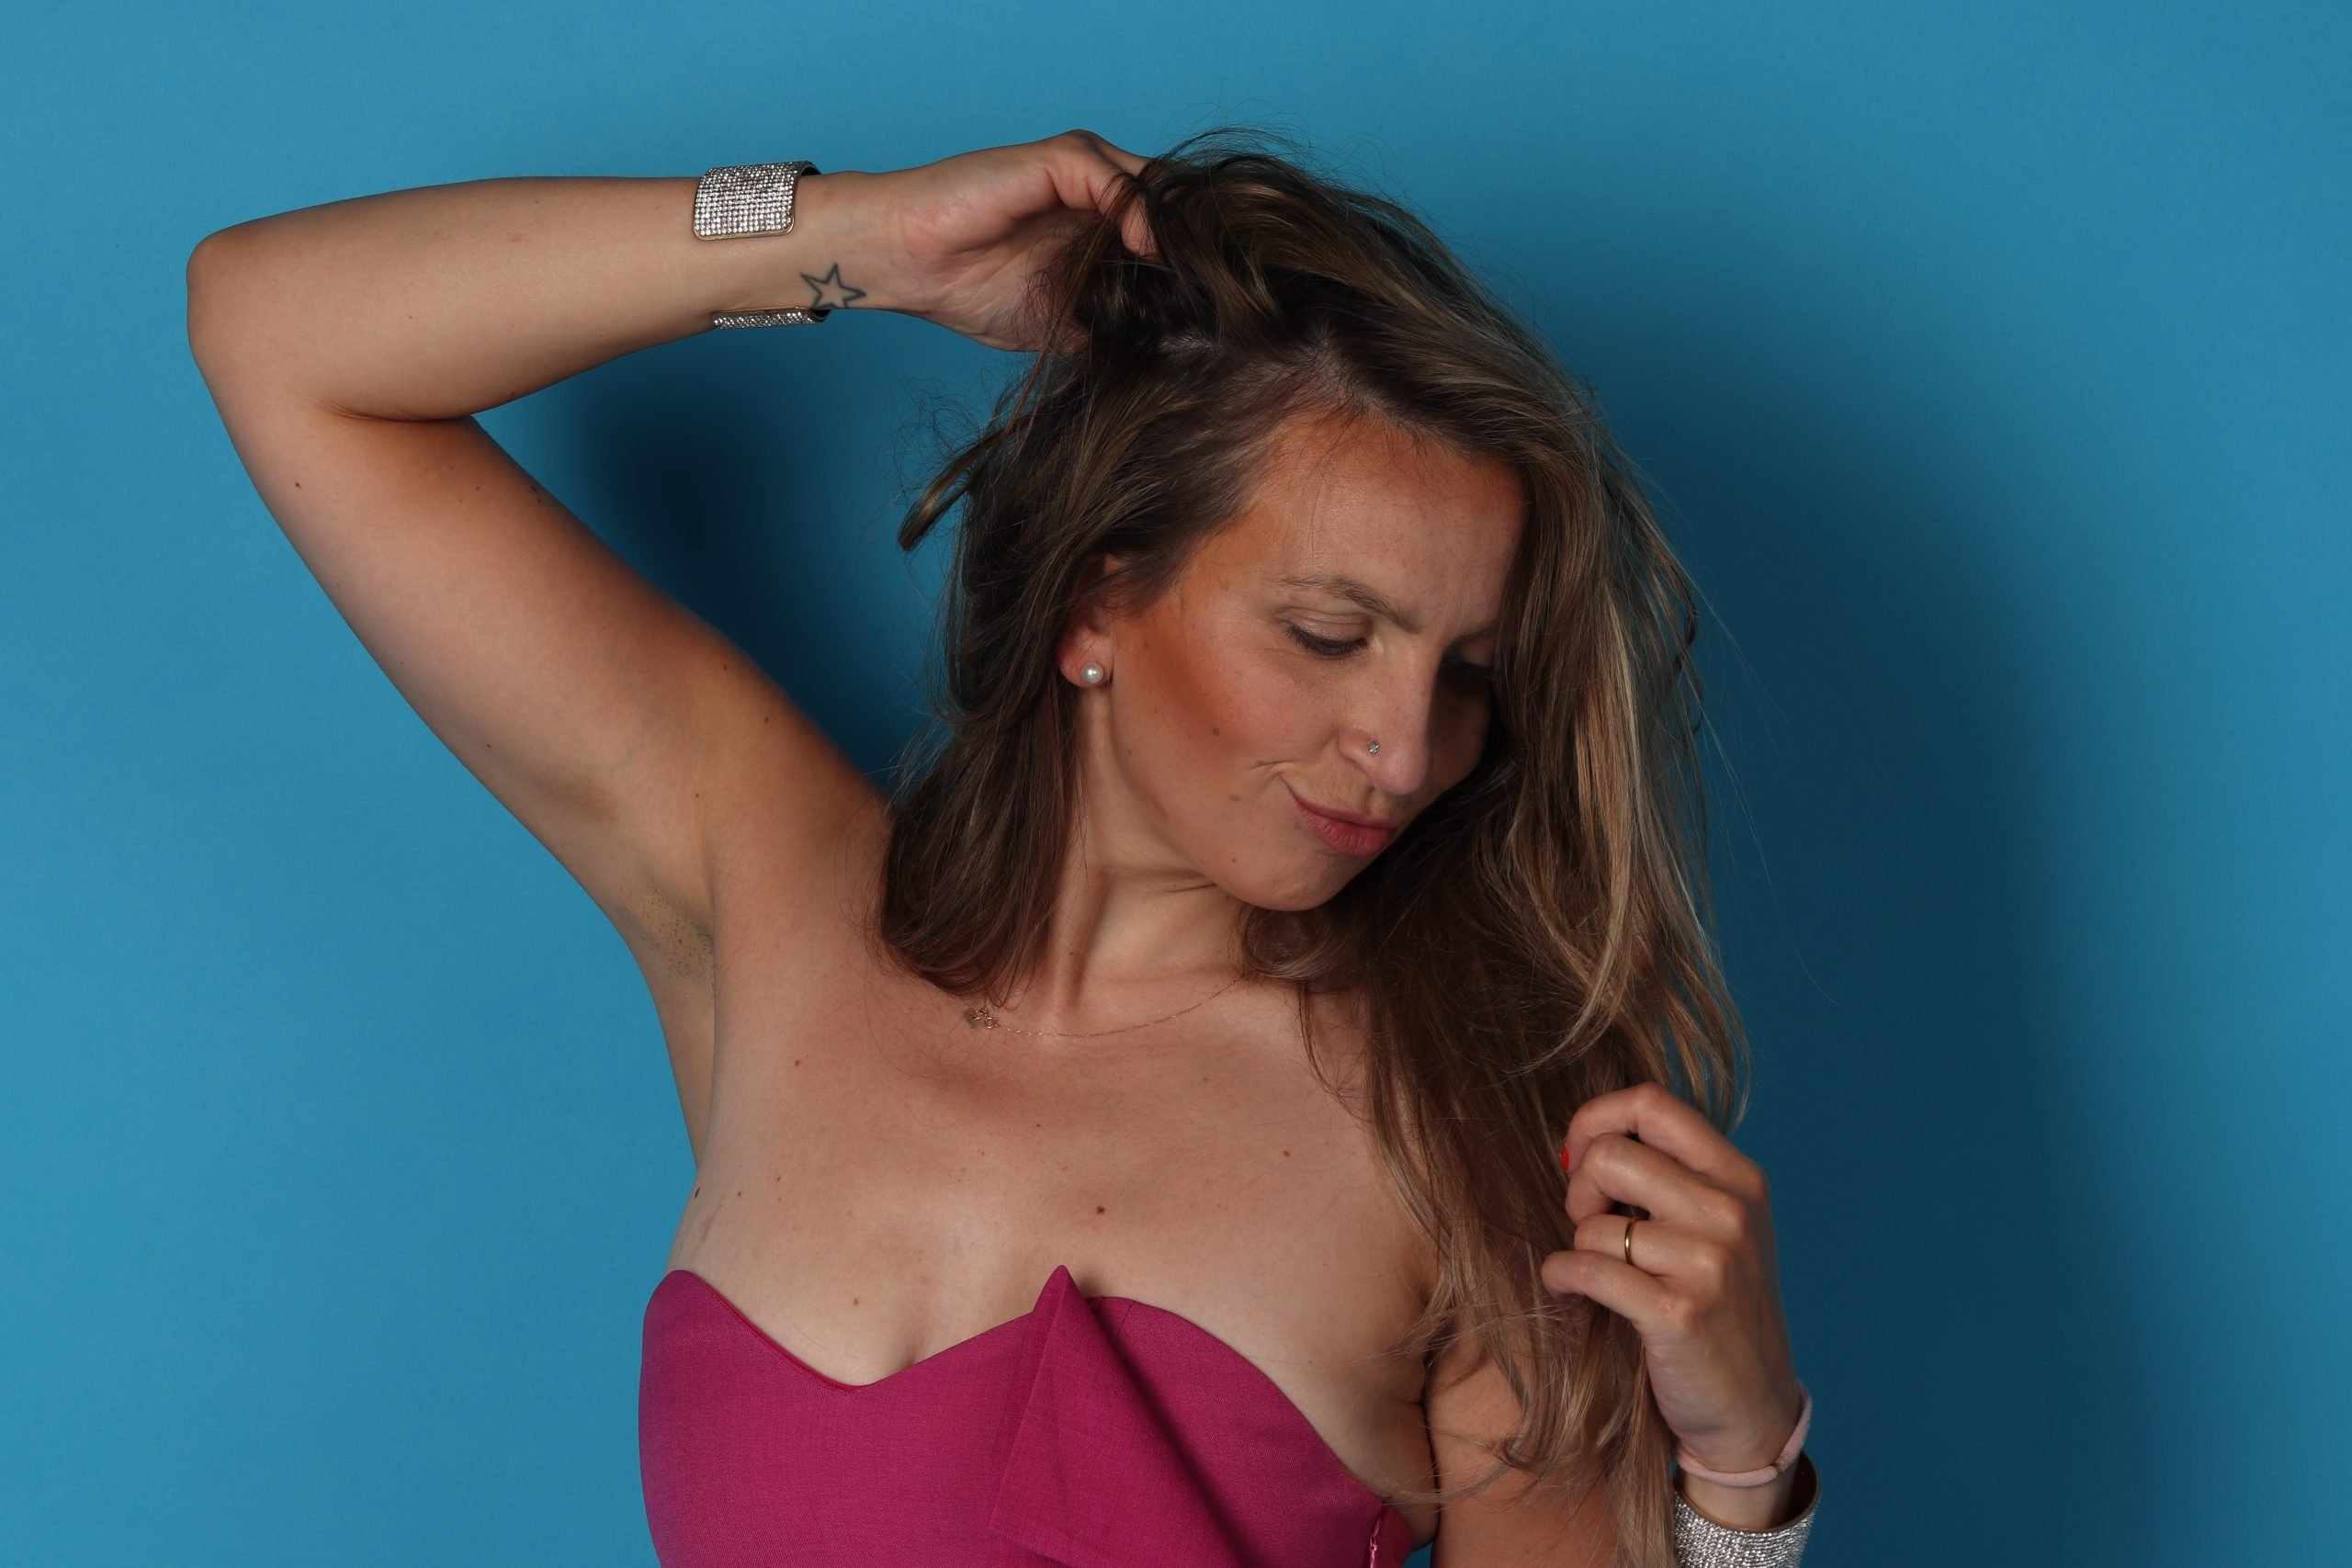 fashion mode roze astrid alida fotografie fotostudio unicorn action reinders badpak bikini muts roze opblaas inflatable parel oorbellen zalando zalon nakd jumpsuit roze pink playsuit long hair